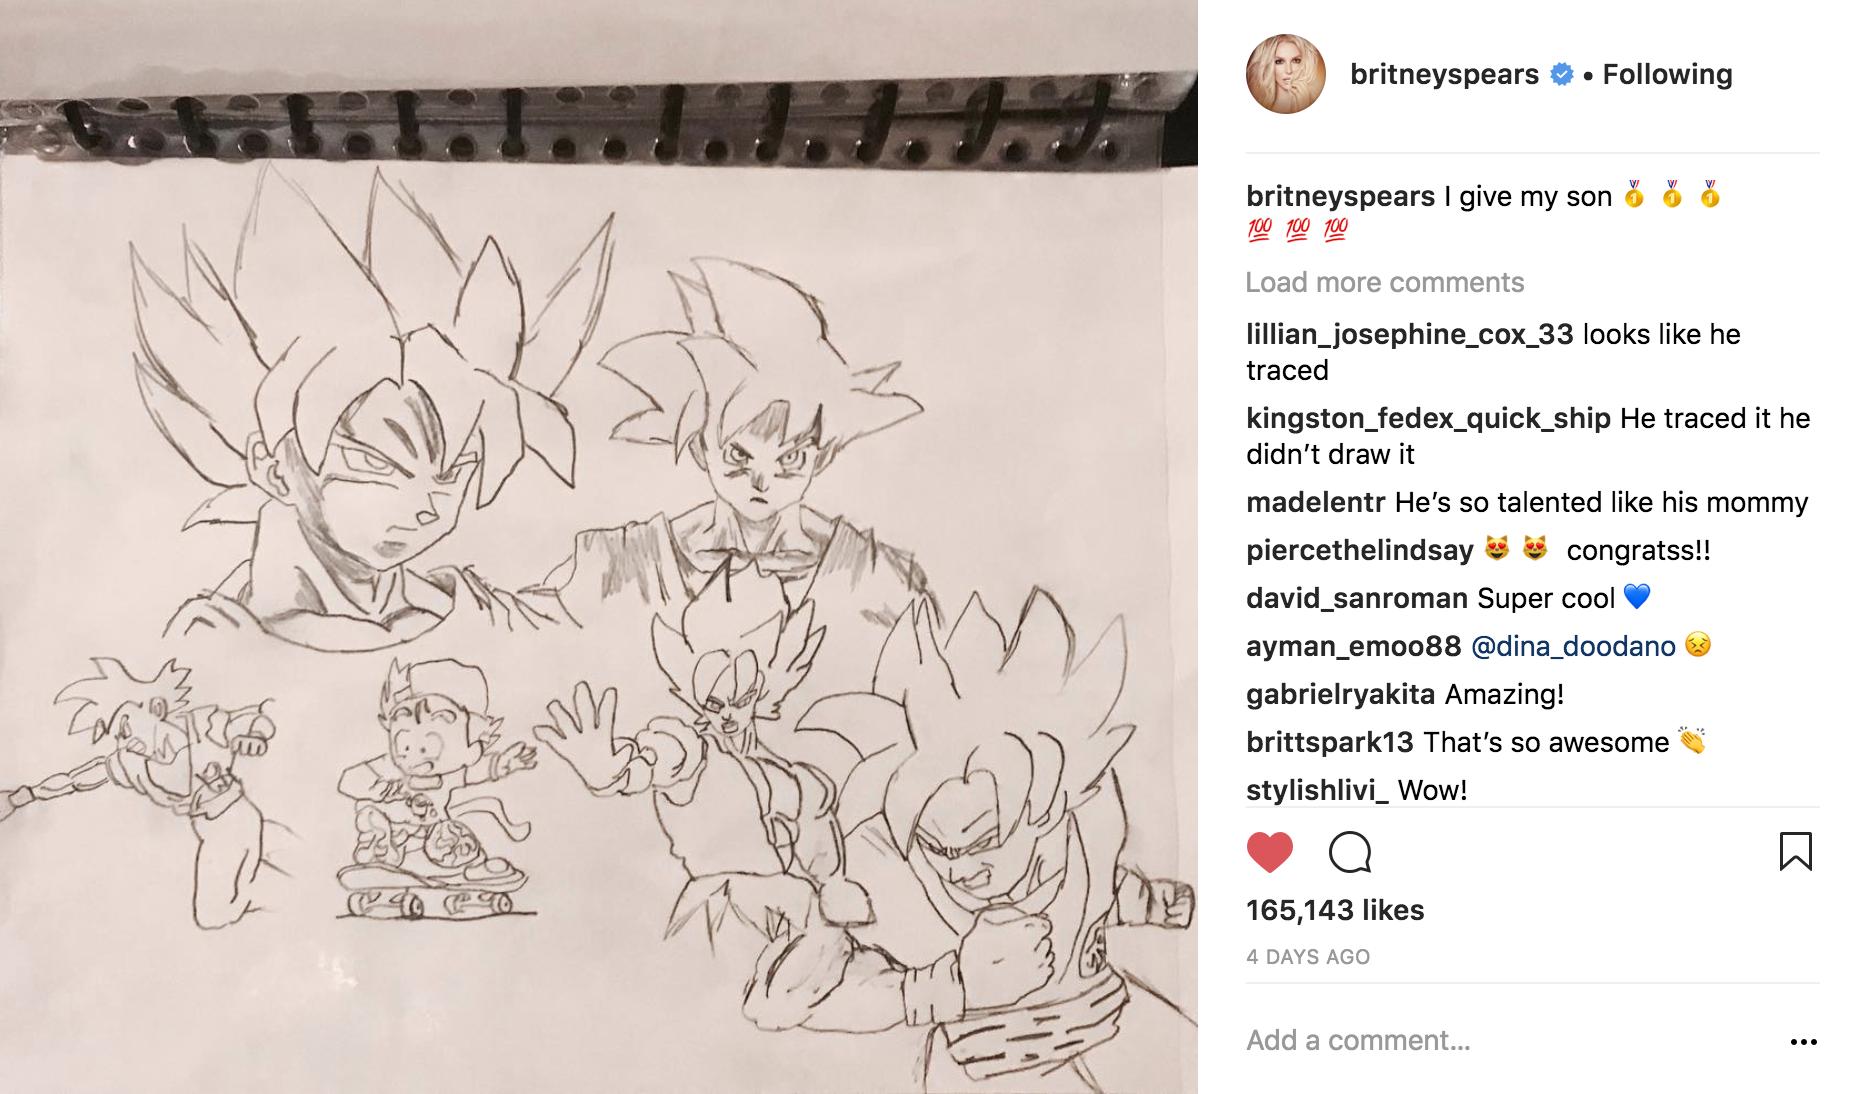 britney spears instagram 2